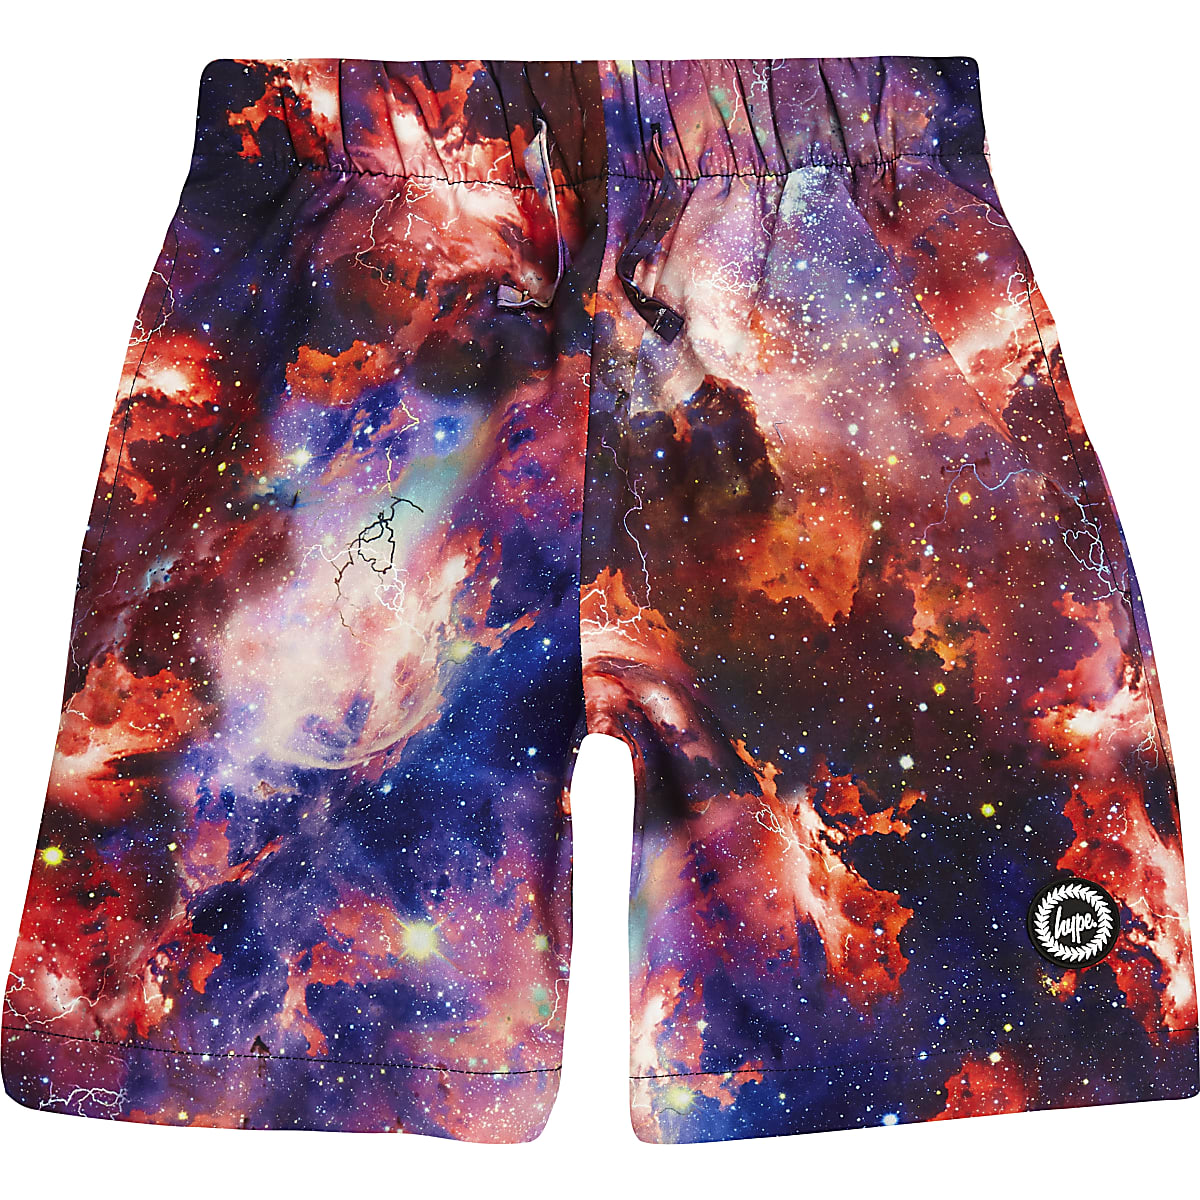 Boys black Hype space swim trunks